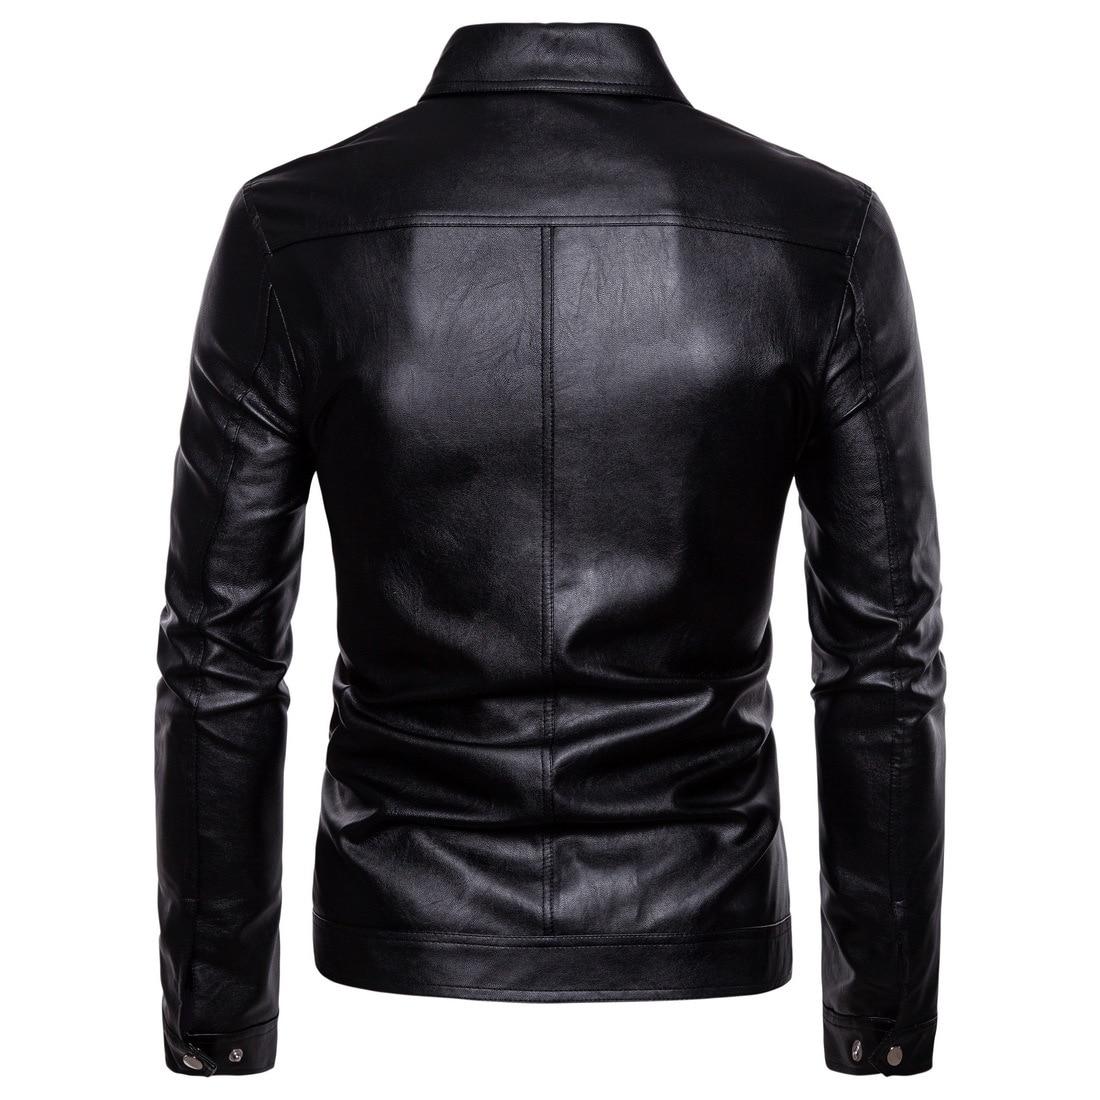 2019 Autumn New Style Europe And America England Washing Locomotive Leather Coat Fold-down Collar PU Leather Jacket Sportsman Co